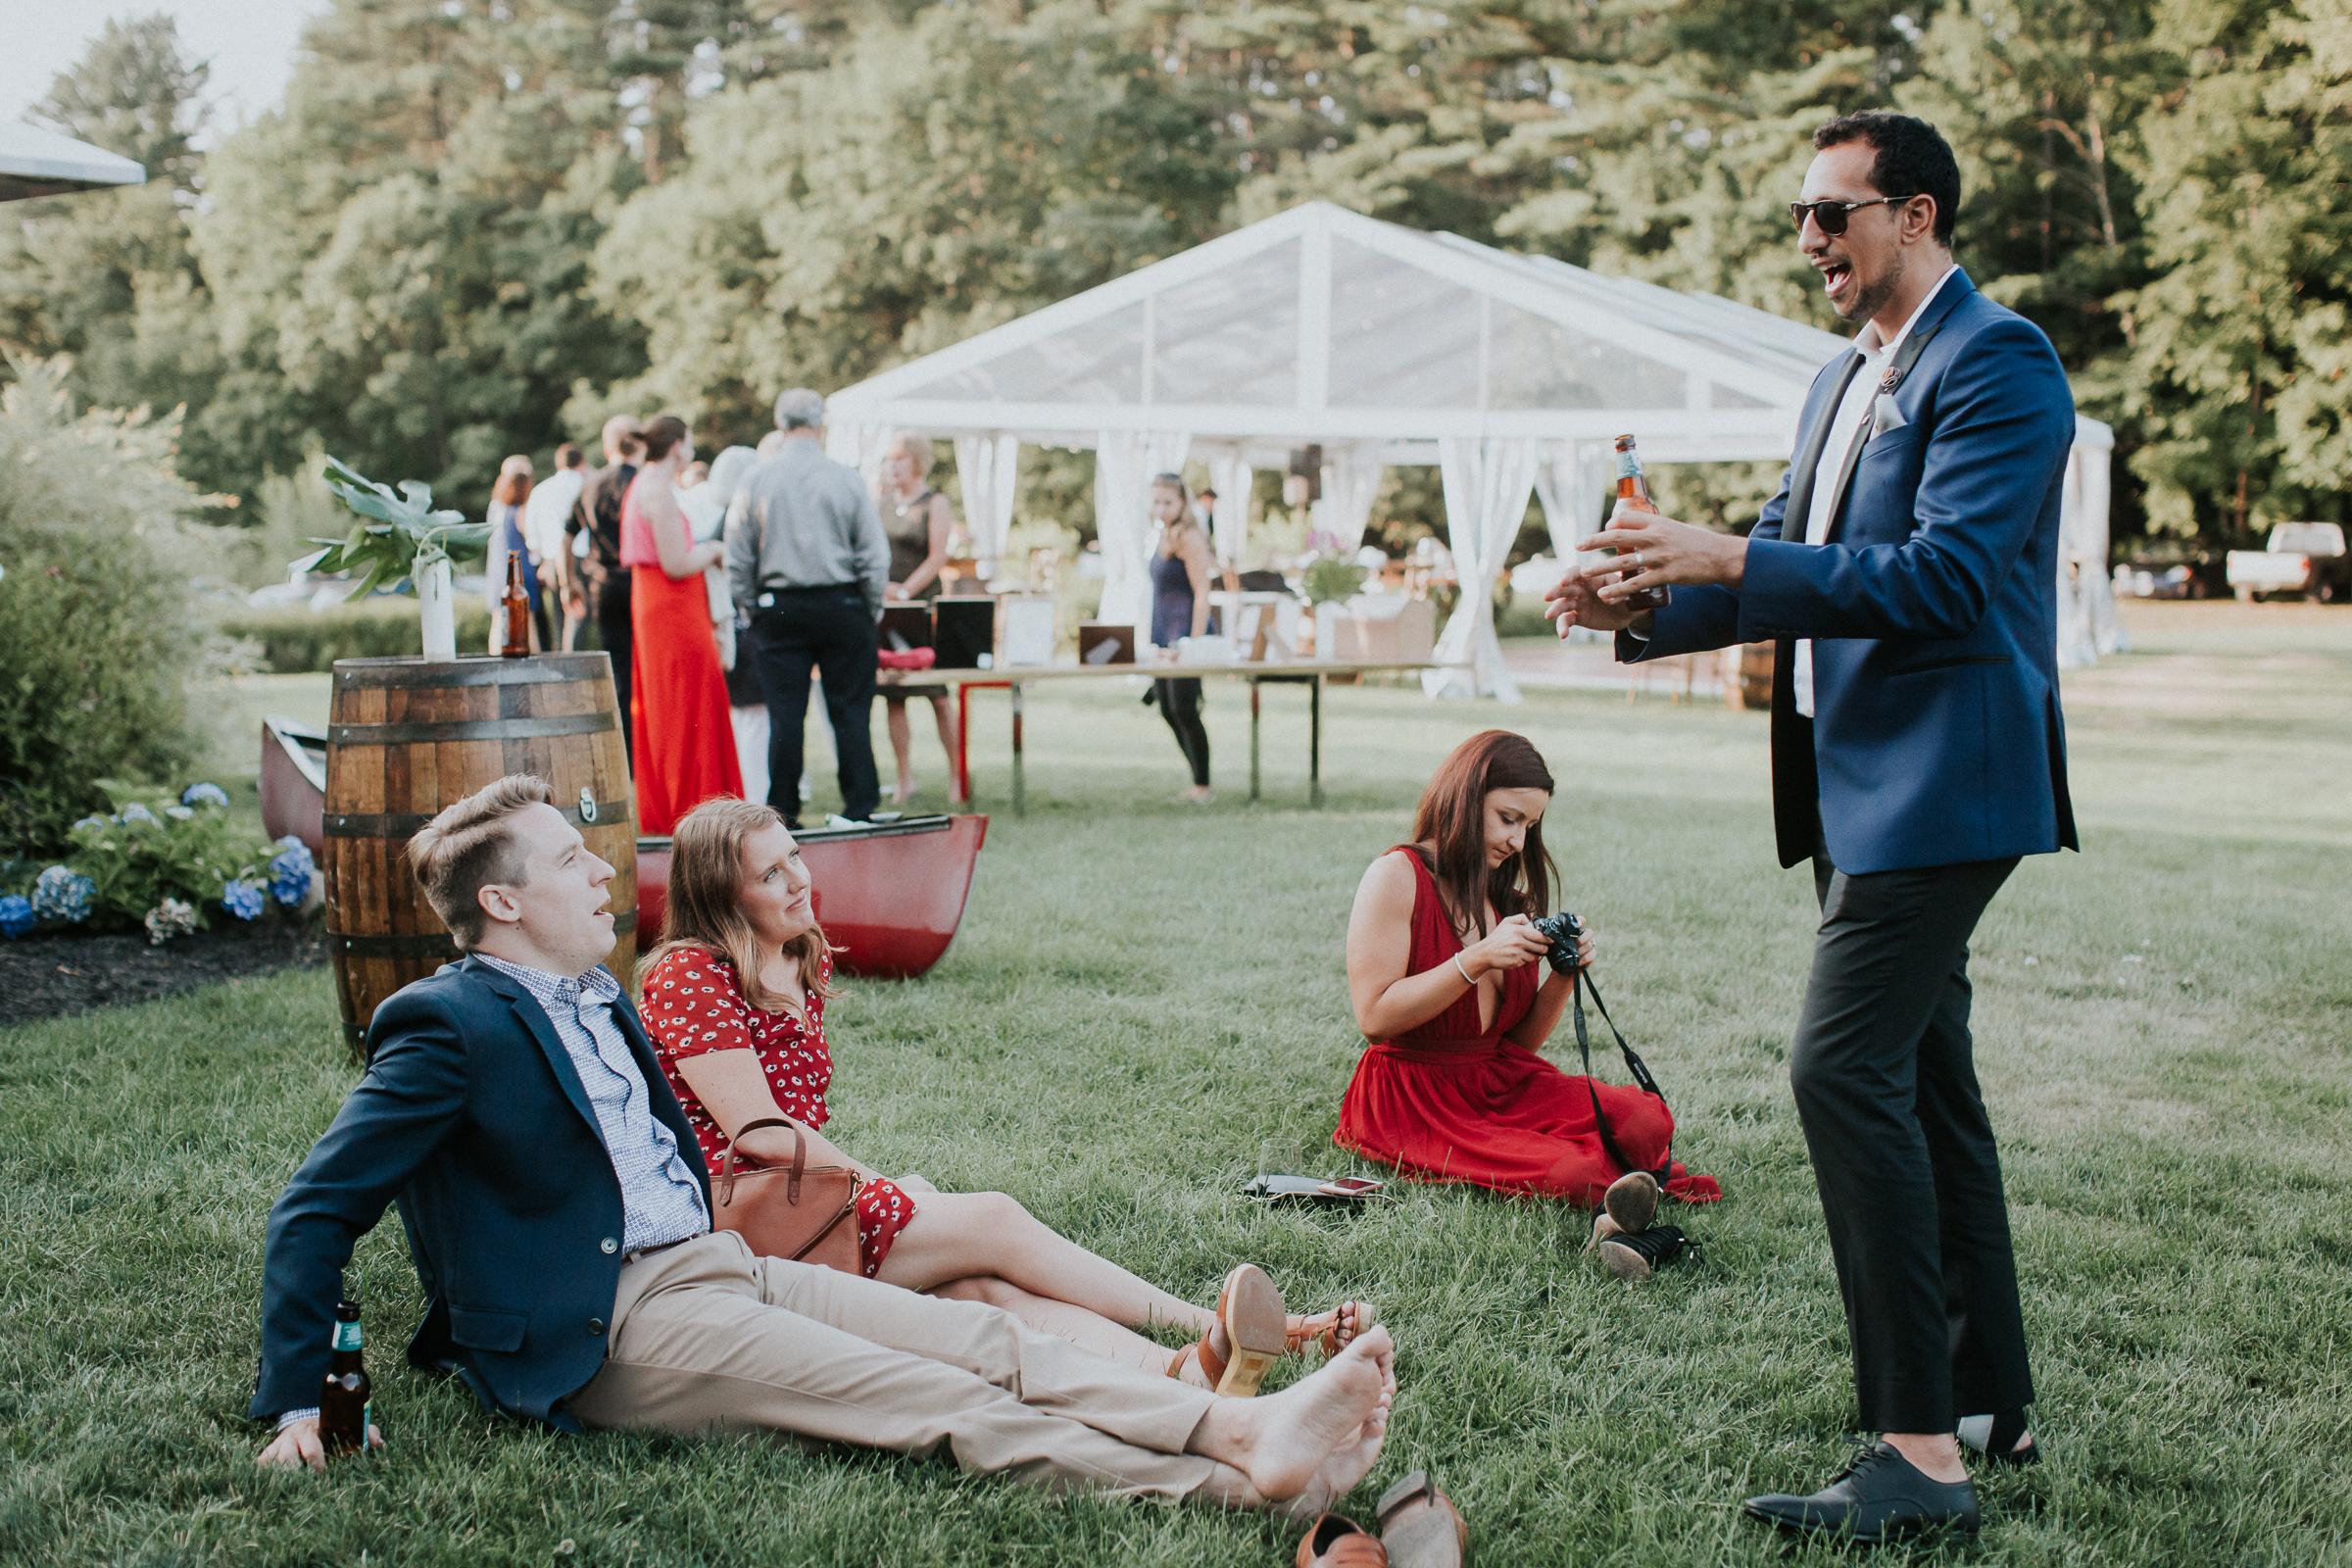 Marianmade-Farm-Wiscasset-Maine-Fine-Art-Documentary-Wedding-Photographer-Elvira-Kalviste-Photography-121.jpg